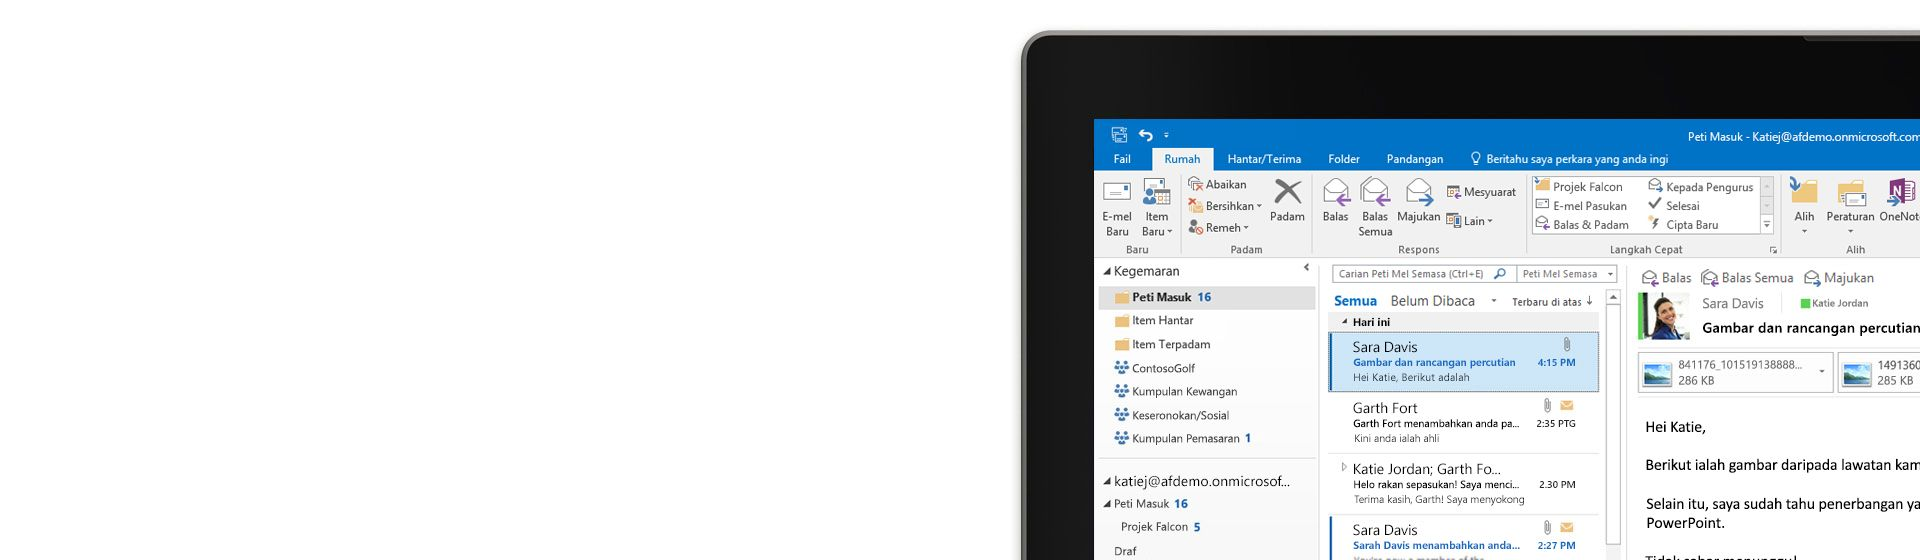 Sebuah tablet menunjukkan peti masuk Microsoft Outlook 2016 dengan senarai mesej dan pratonton